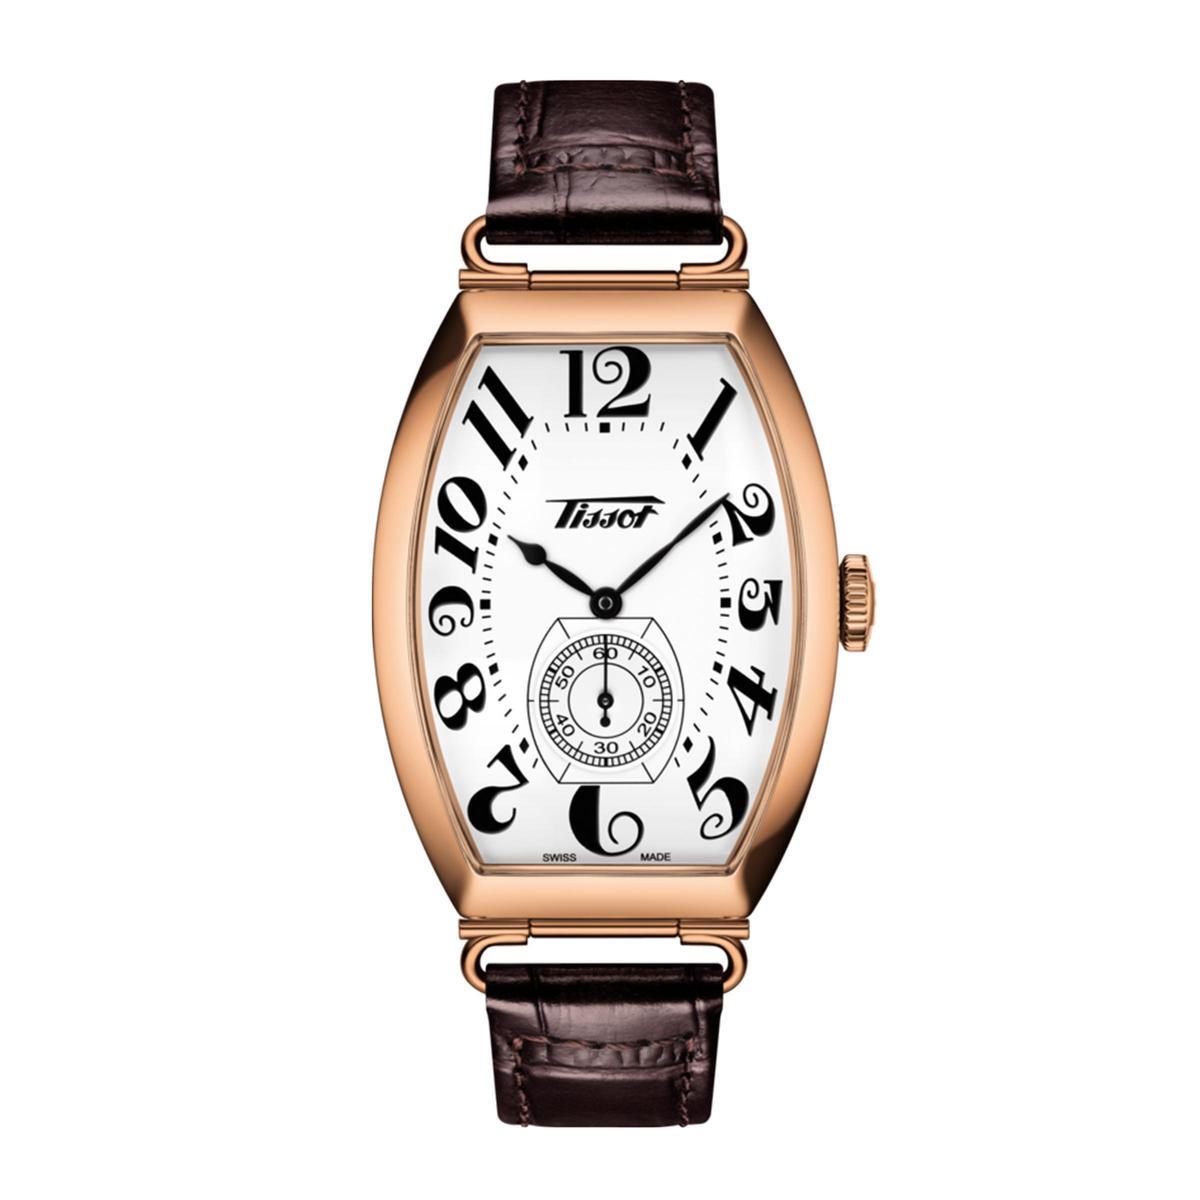 天梭Heritage Porto手上鏈腕錶,定價NT$37,600。